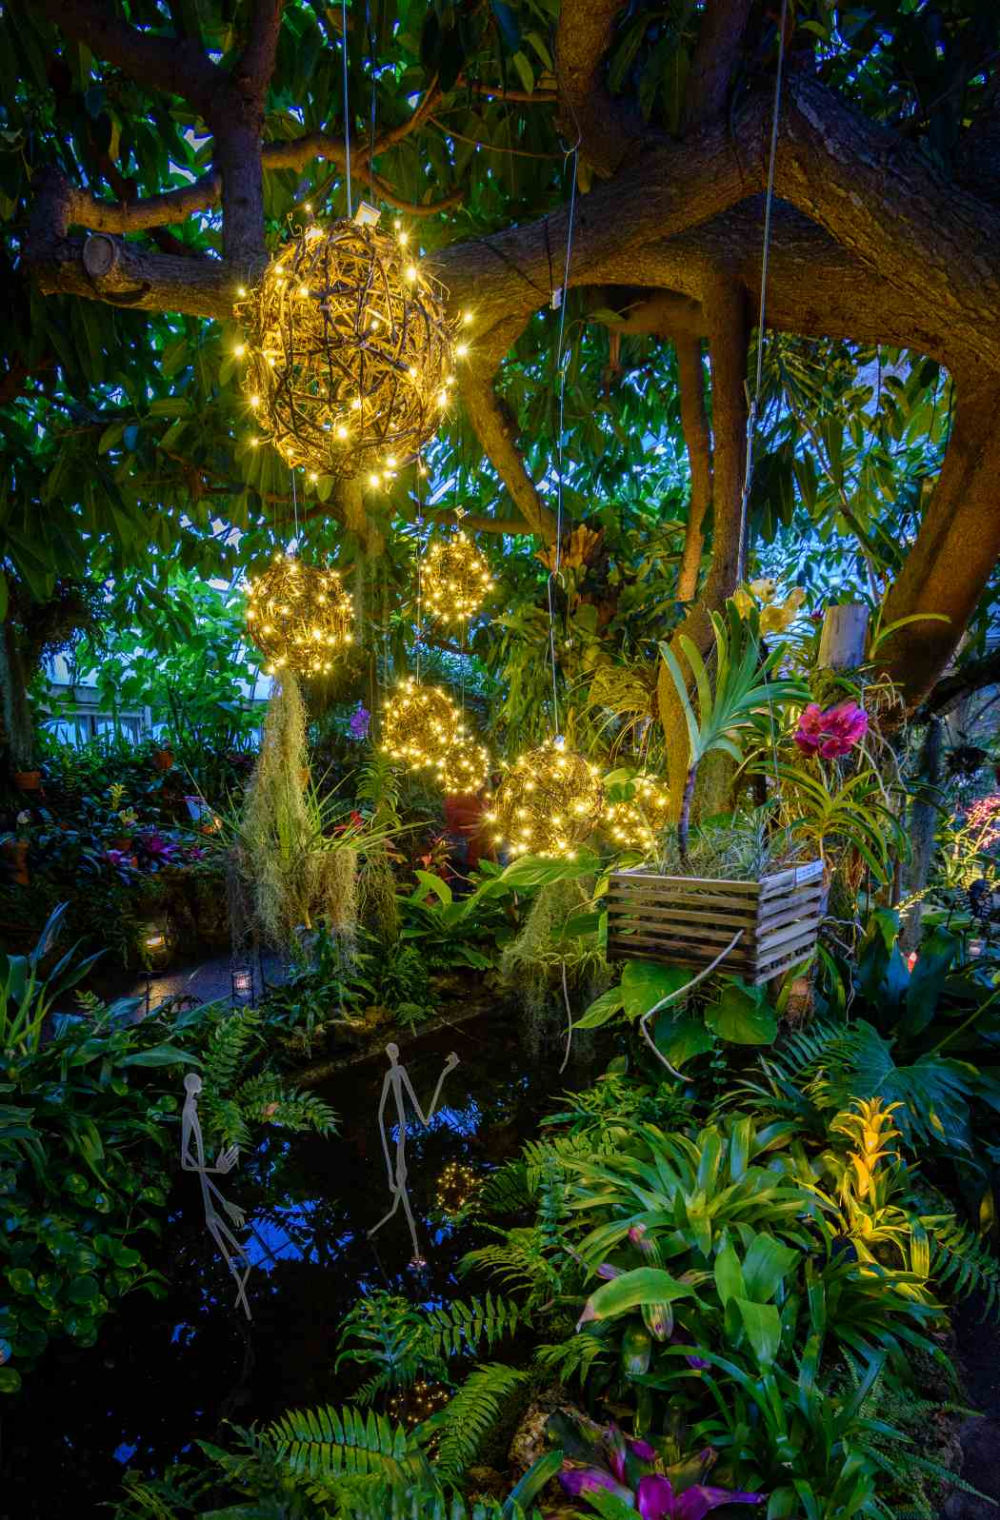 7996b0ae8ea0b6d91d773da8d1e03422 - Botanical Gardens St Louis Light Show